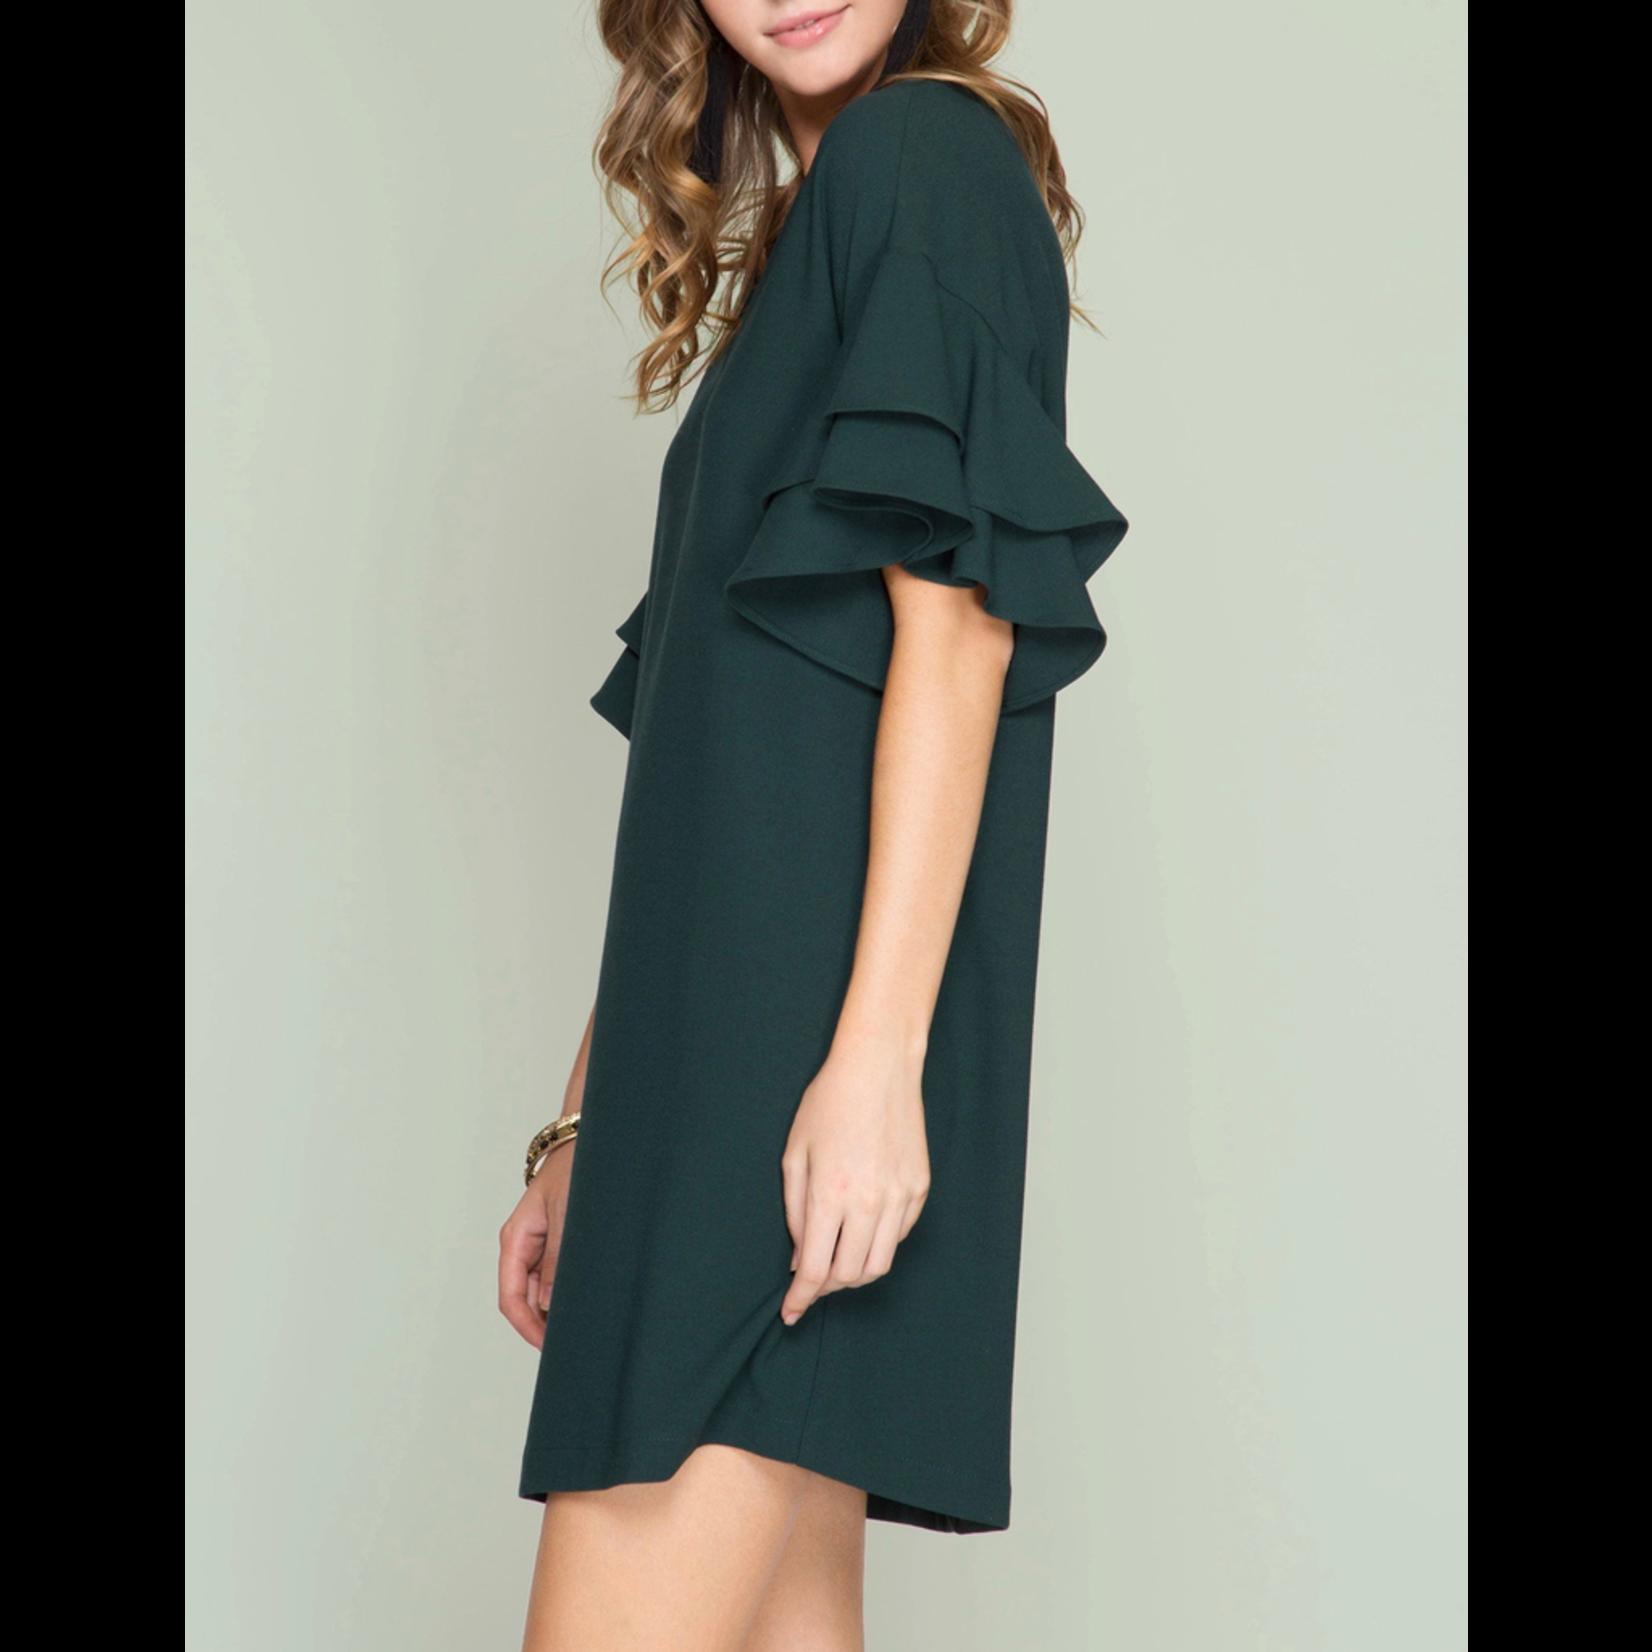 She & Sky Double Ruffled Sleeve Shift Dress